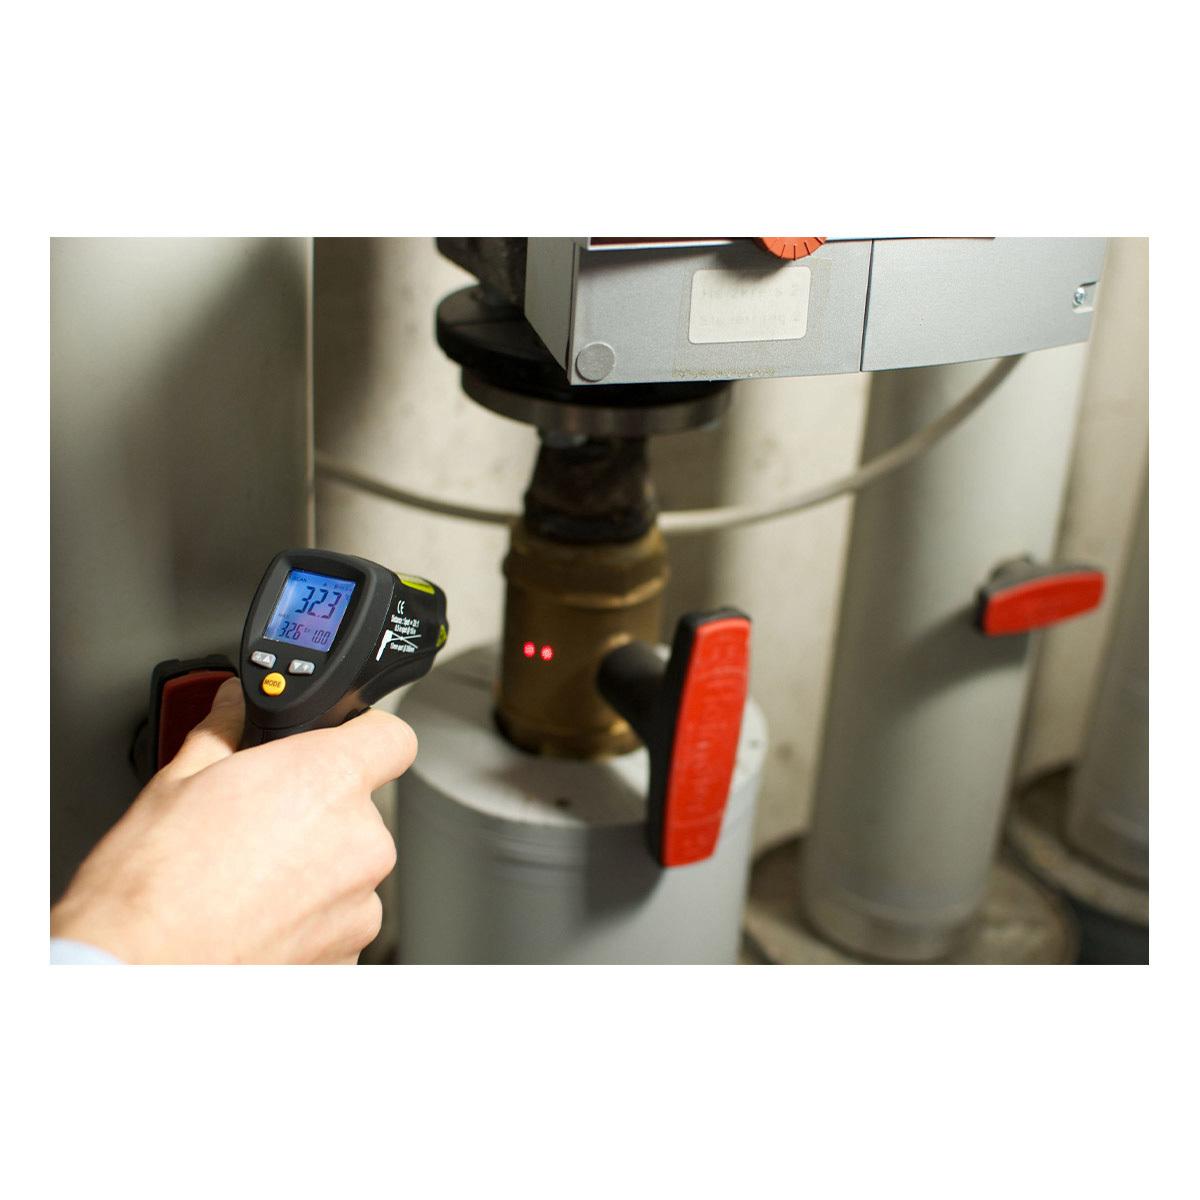 31-1124-infrarot-thermometer-scantemp-485-anwendung3-1200x1200px.jpg